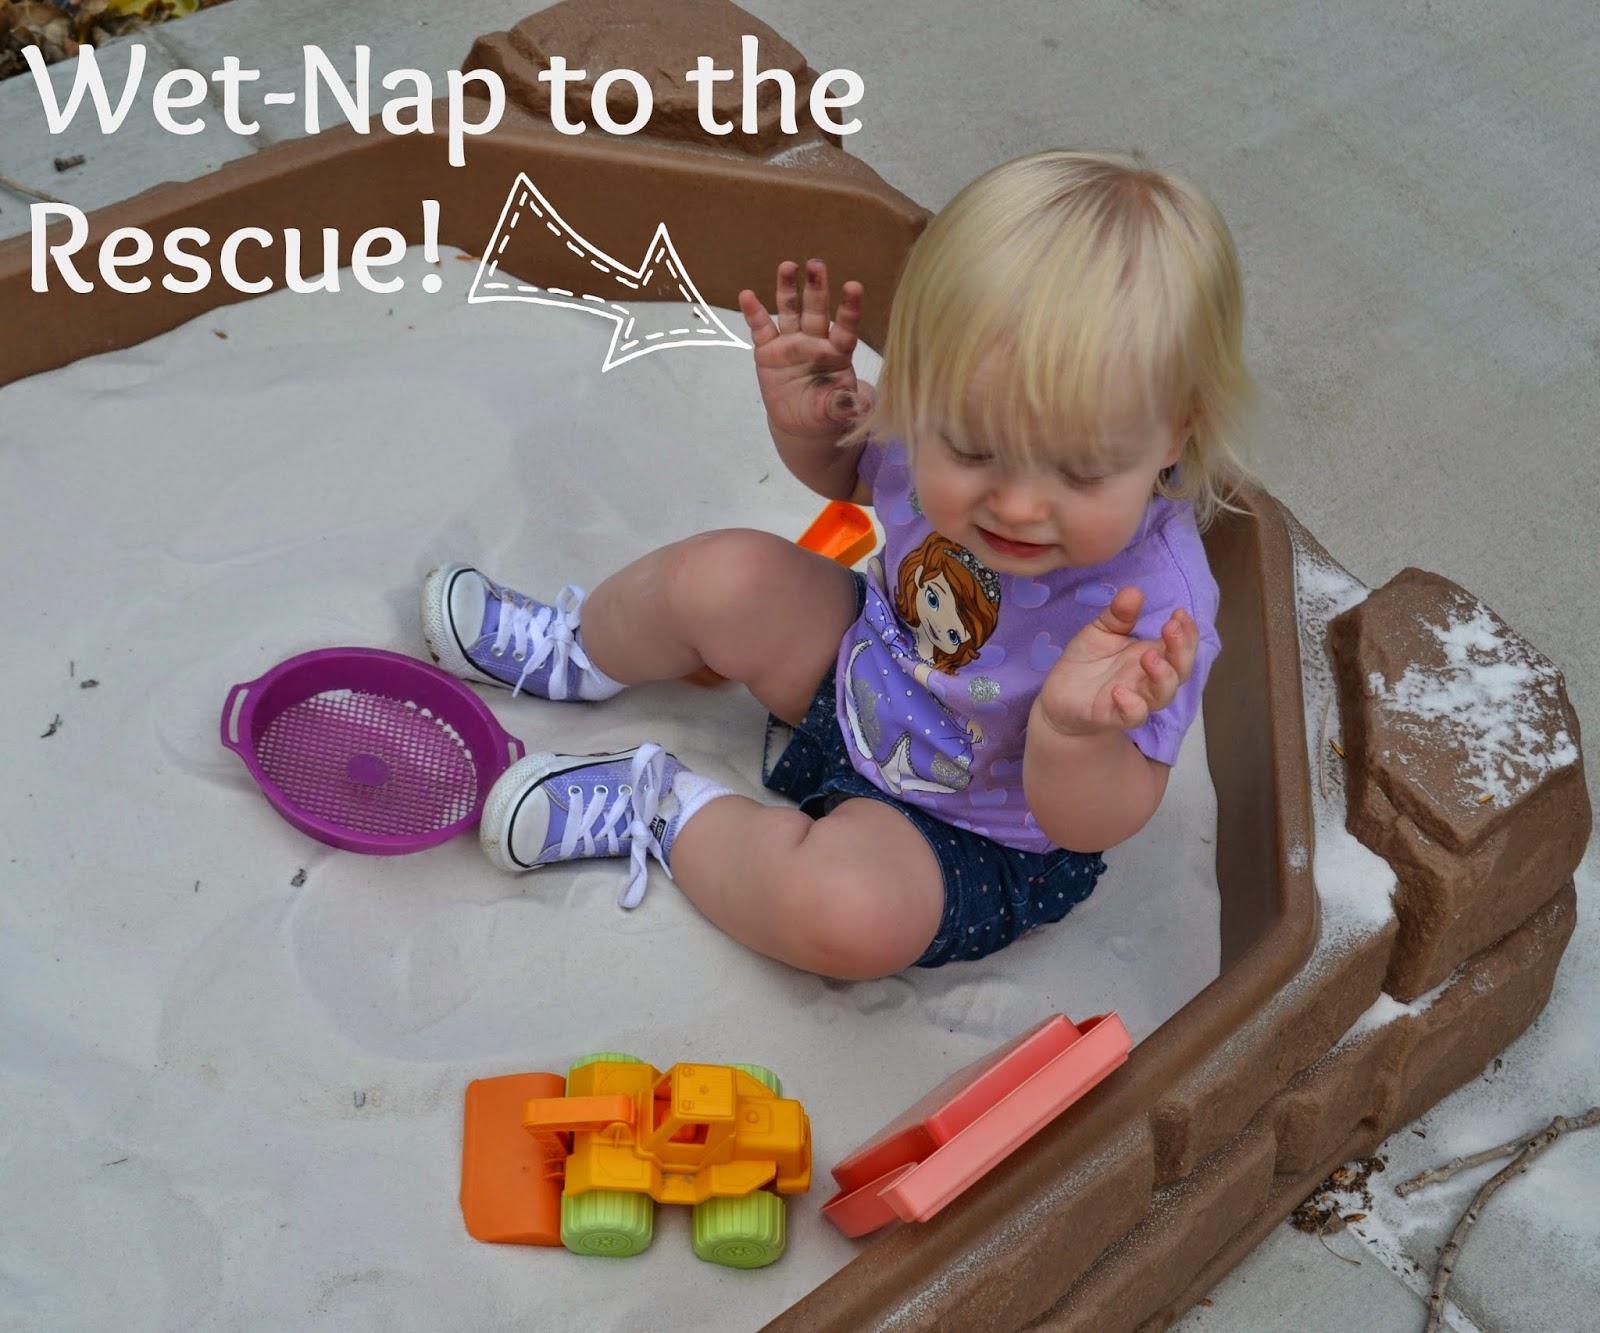 Backyard Picnic Activities with Wet-Nap  #ShowUsYourMess #PMedia #ad.  Wet-Nap Antibacterial Hand Wipes.